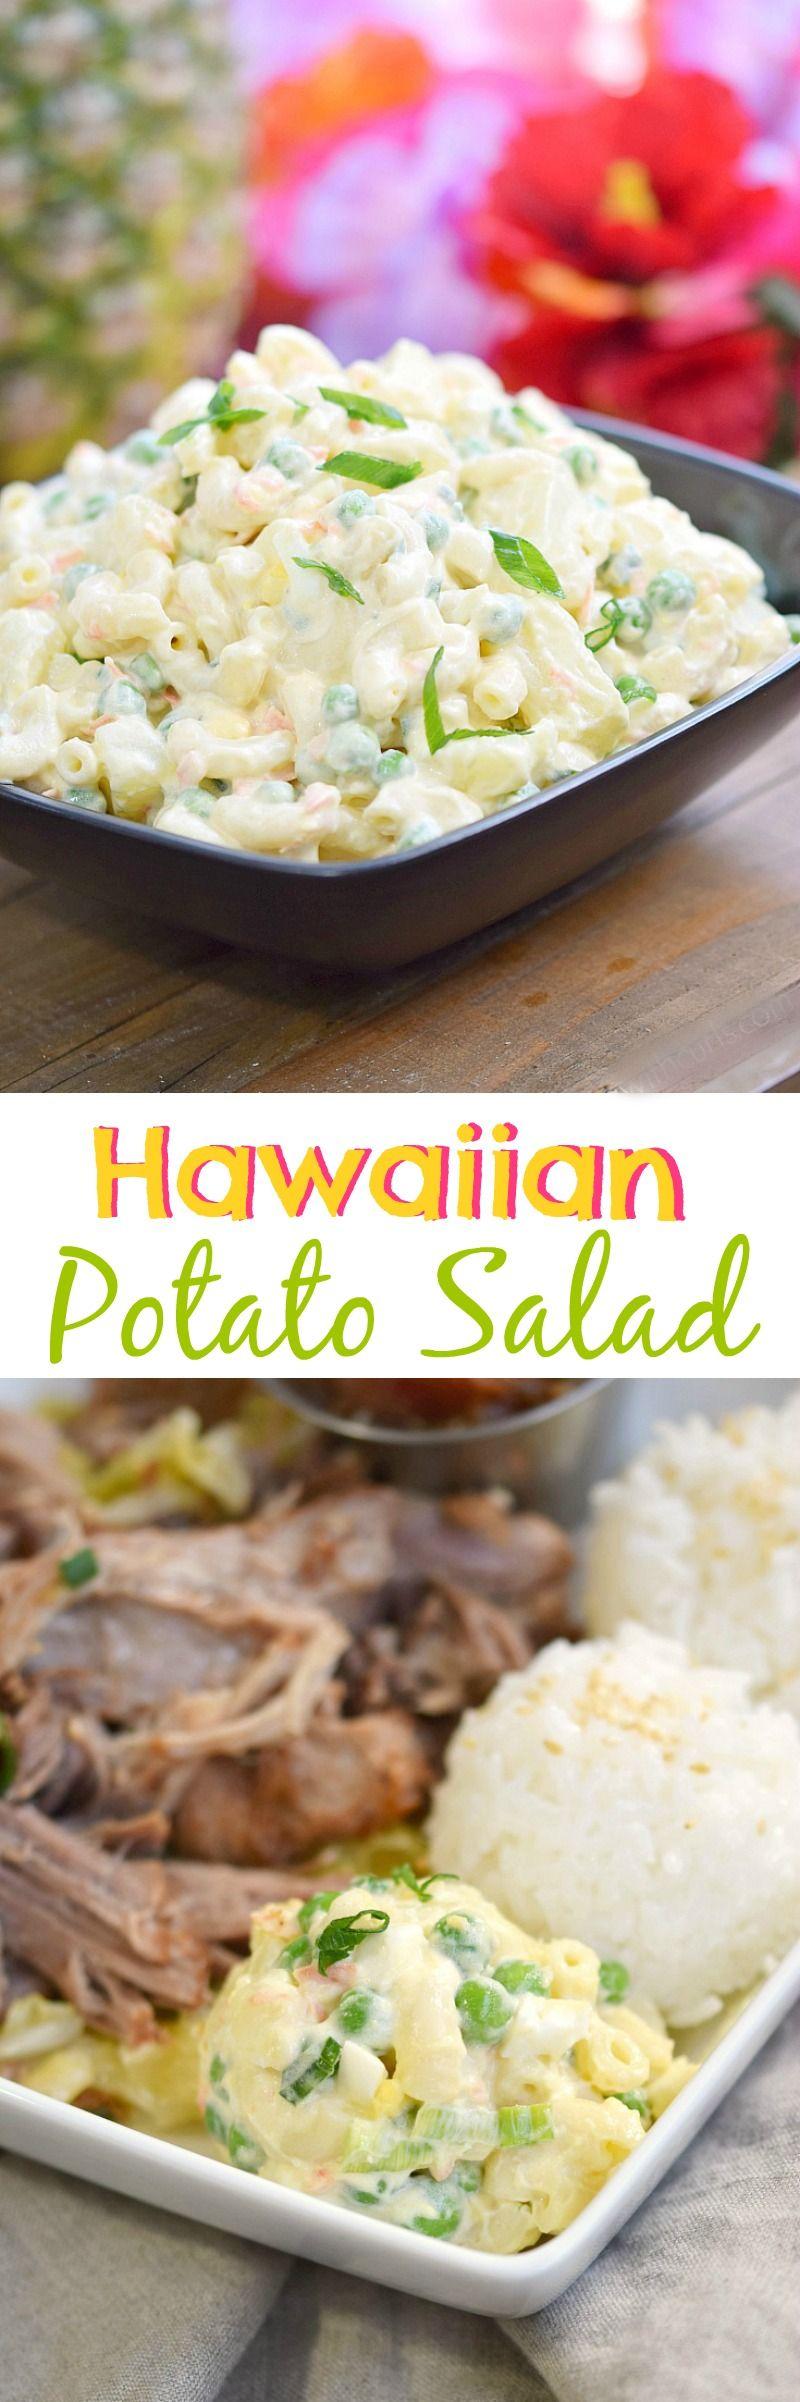 Hawaiian potato salad recipe hawaiian potato salad